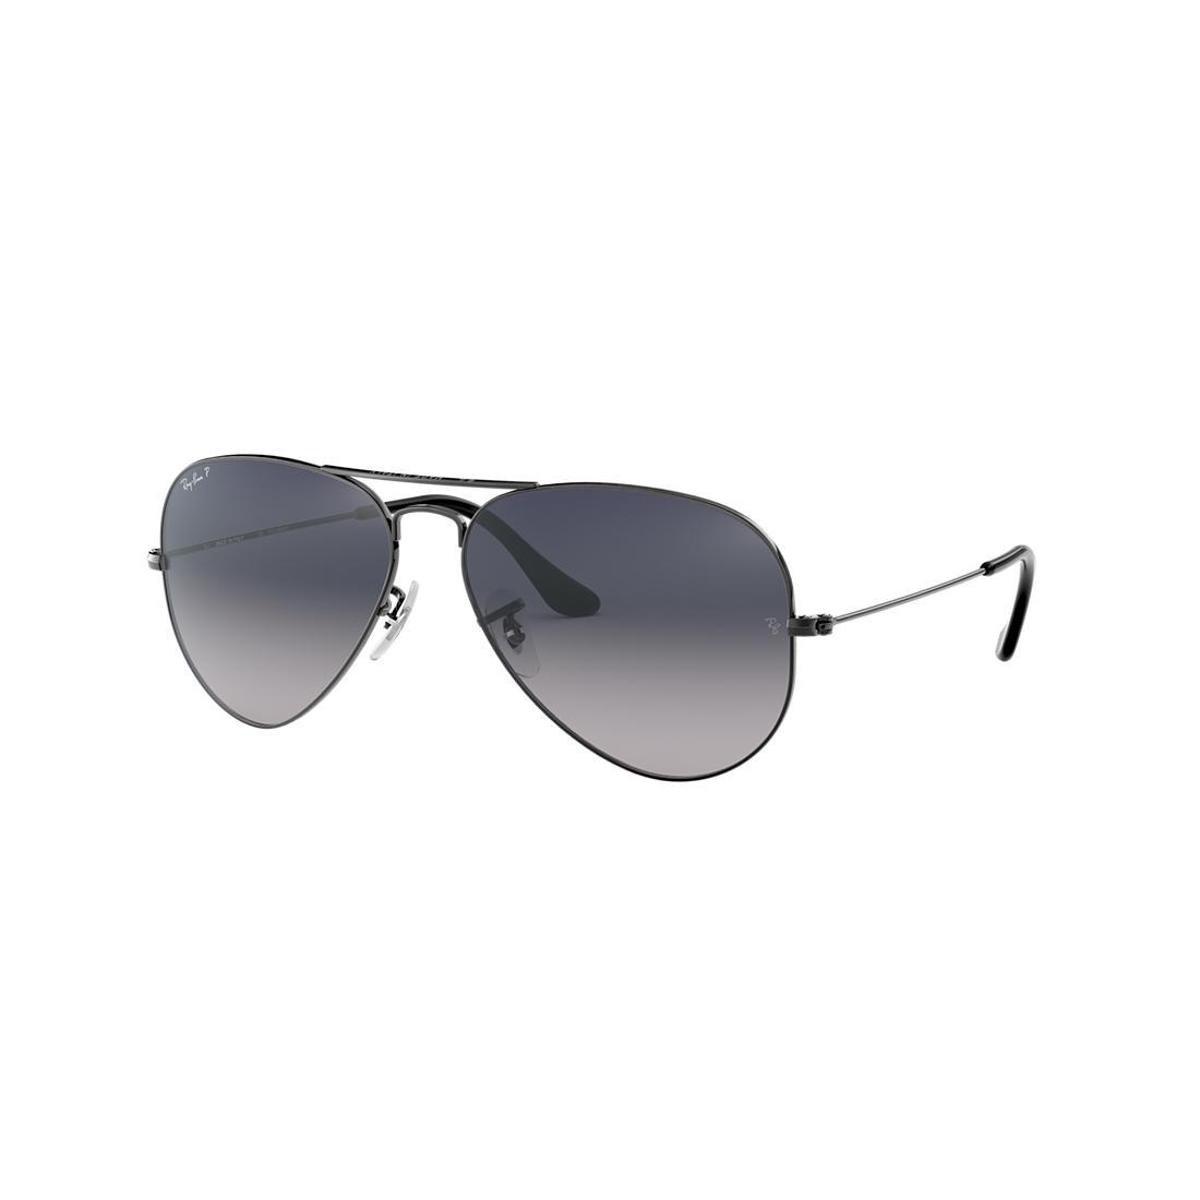 639c7f75e Óculos de Sol Ray-Ban RB3025 Aviator Gradiente - Cinza | Zattini